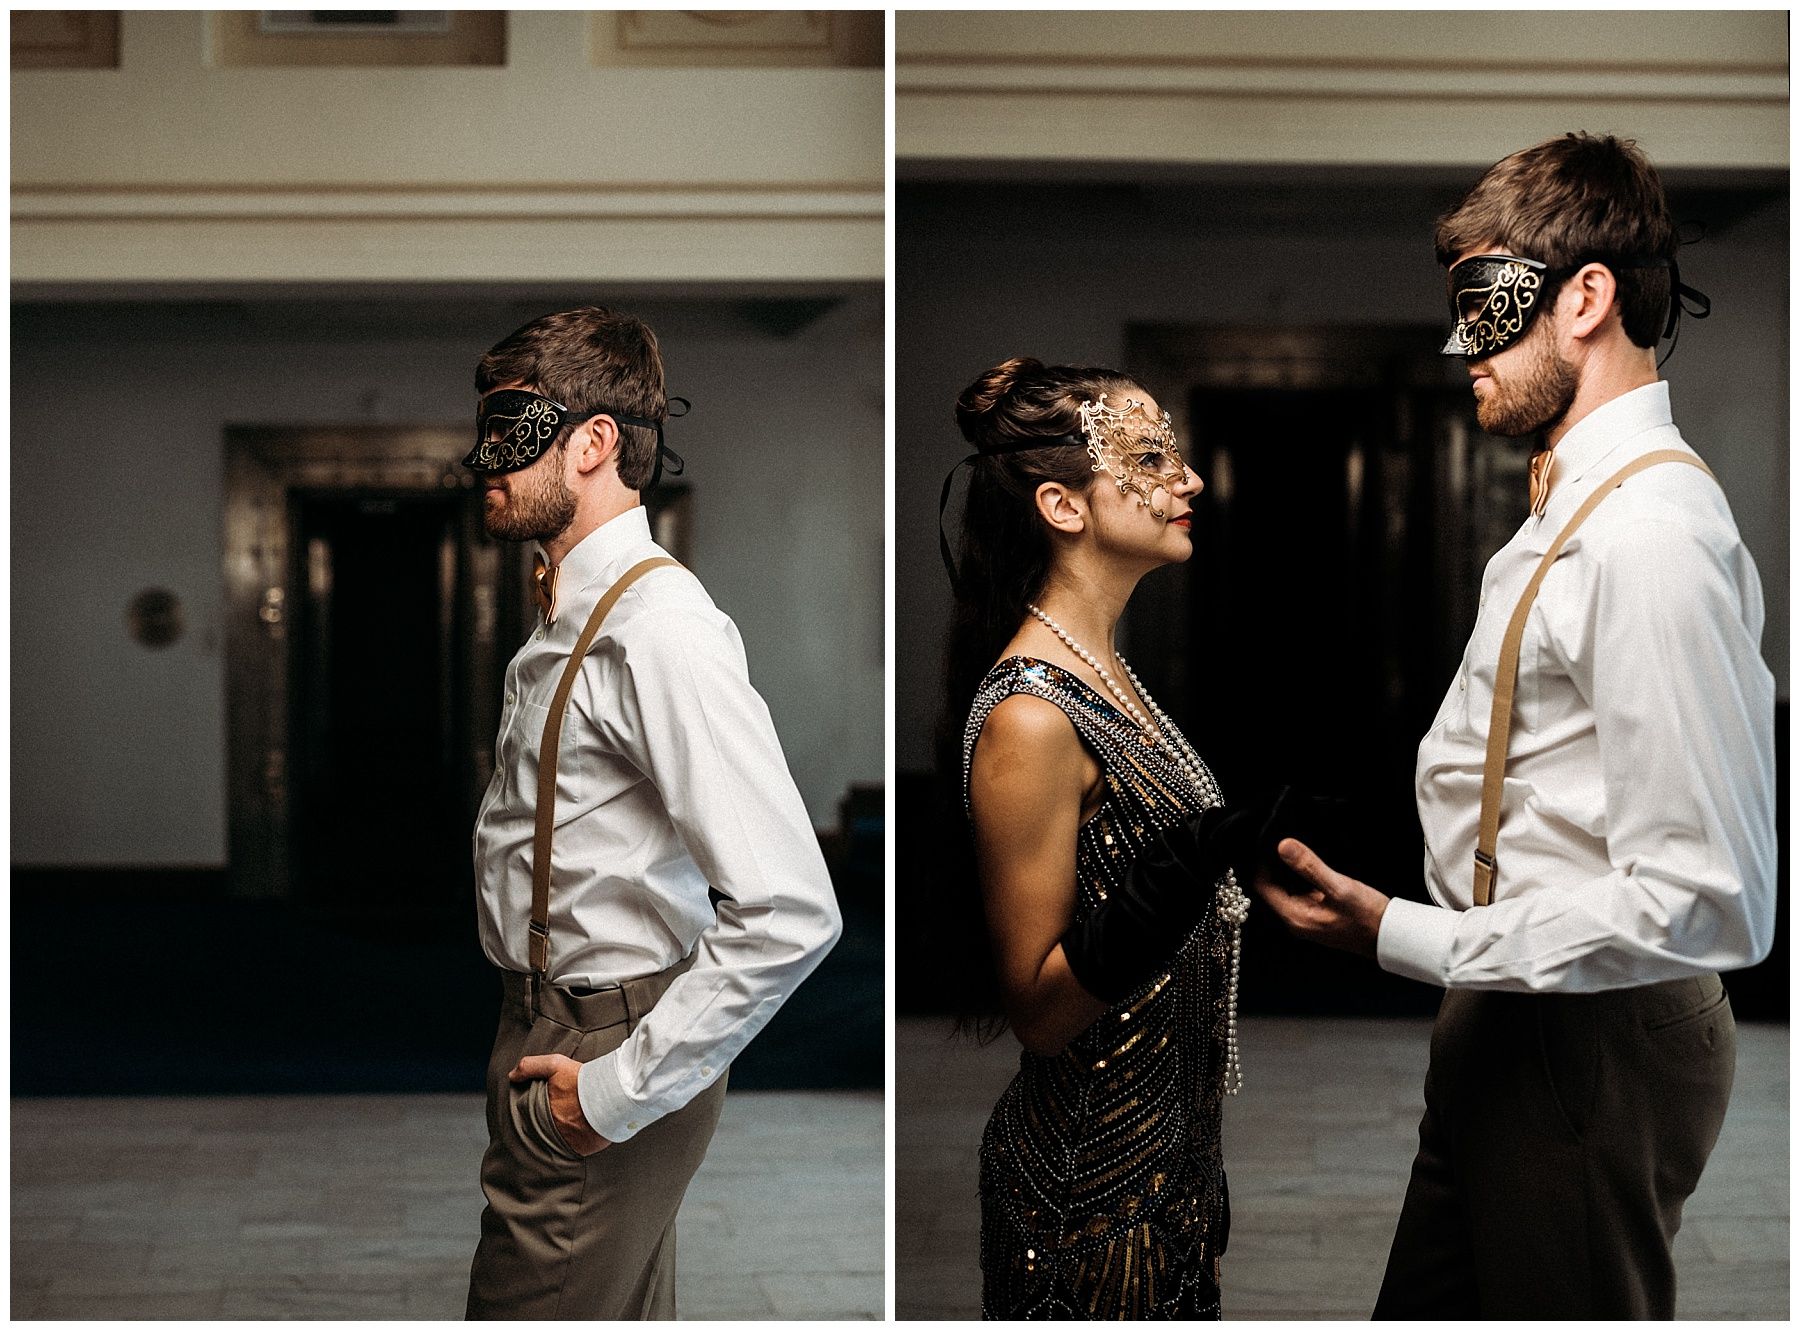 gatsby-styled-couples-shoot-final-g-web-20190707-0027_CCS-1.jpg